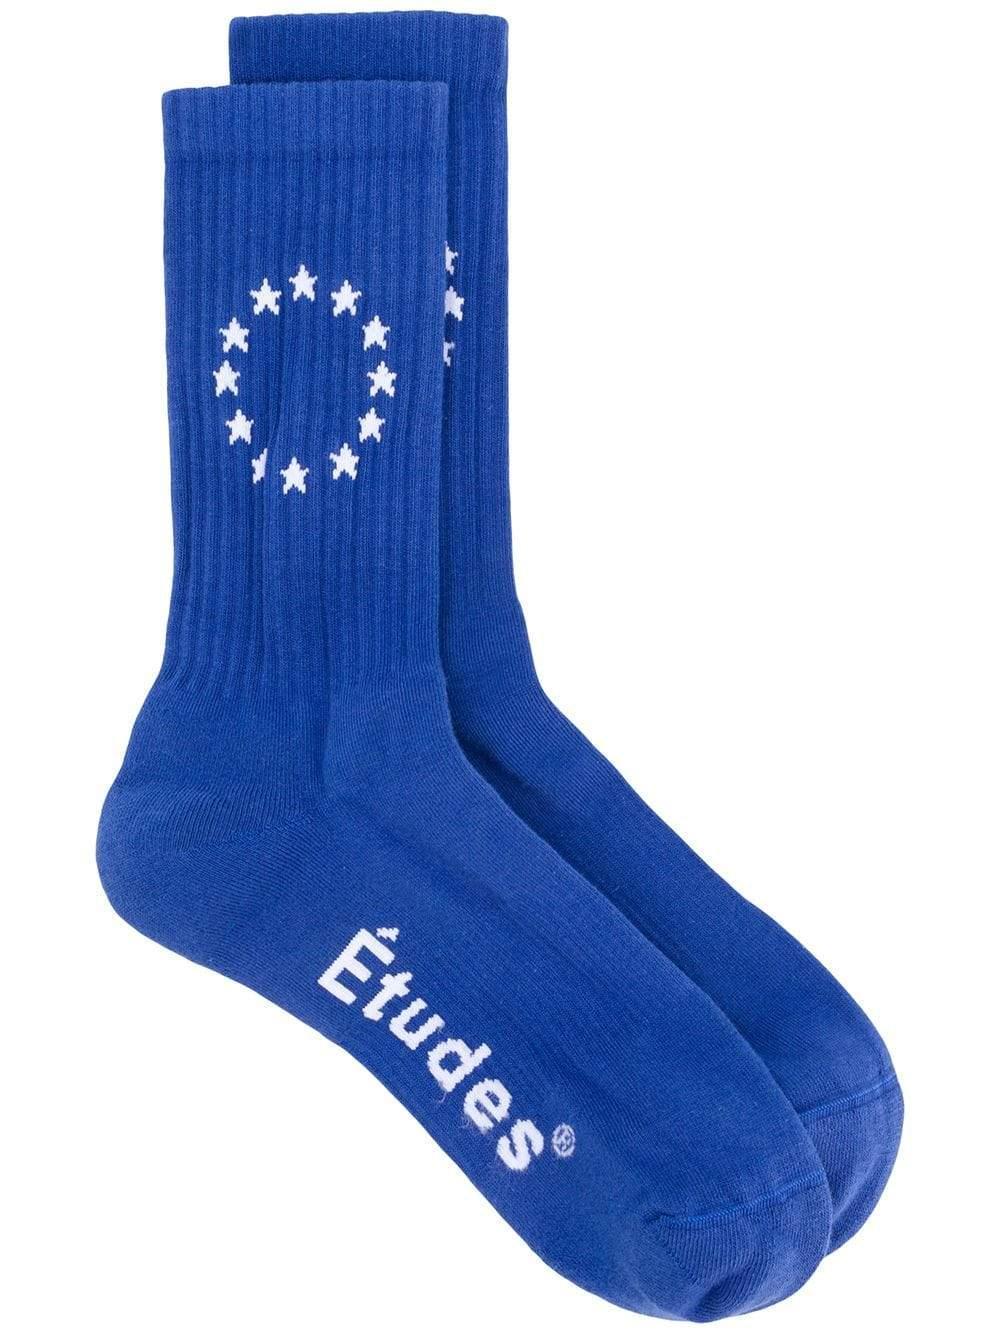 Etudes Studio Logo Embroidered Socks in Blue - Lyst